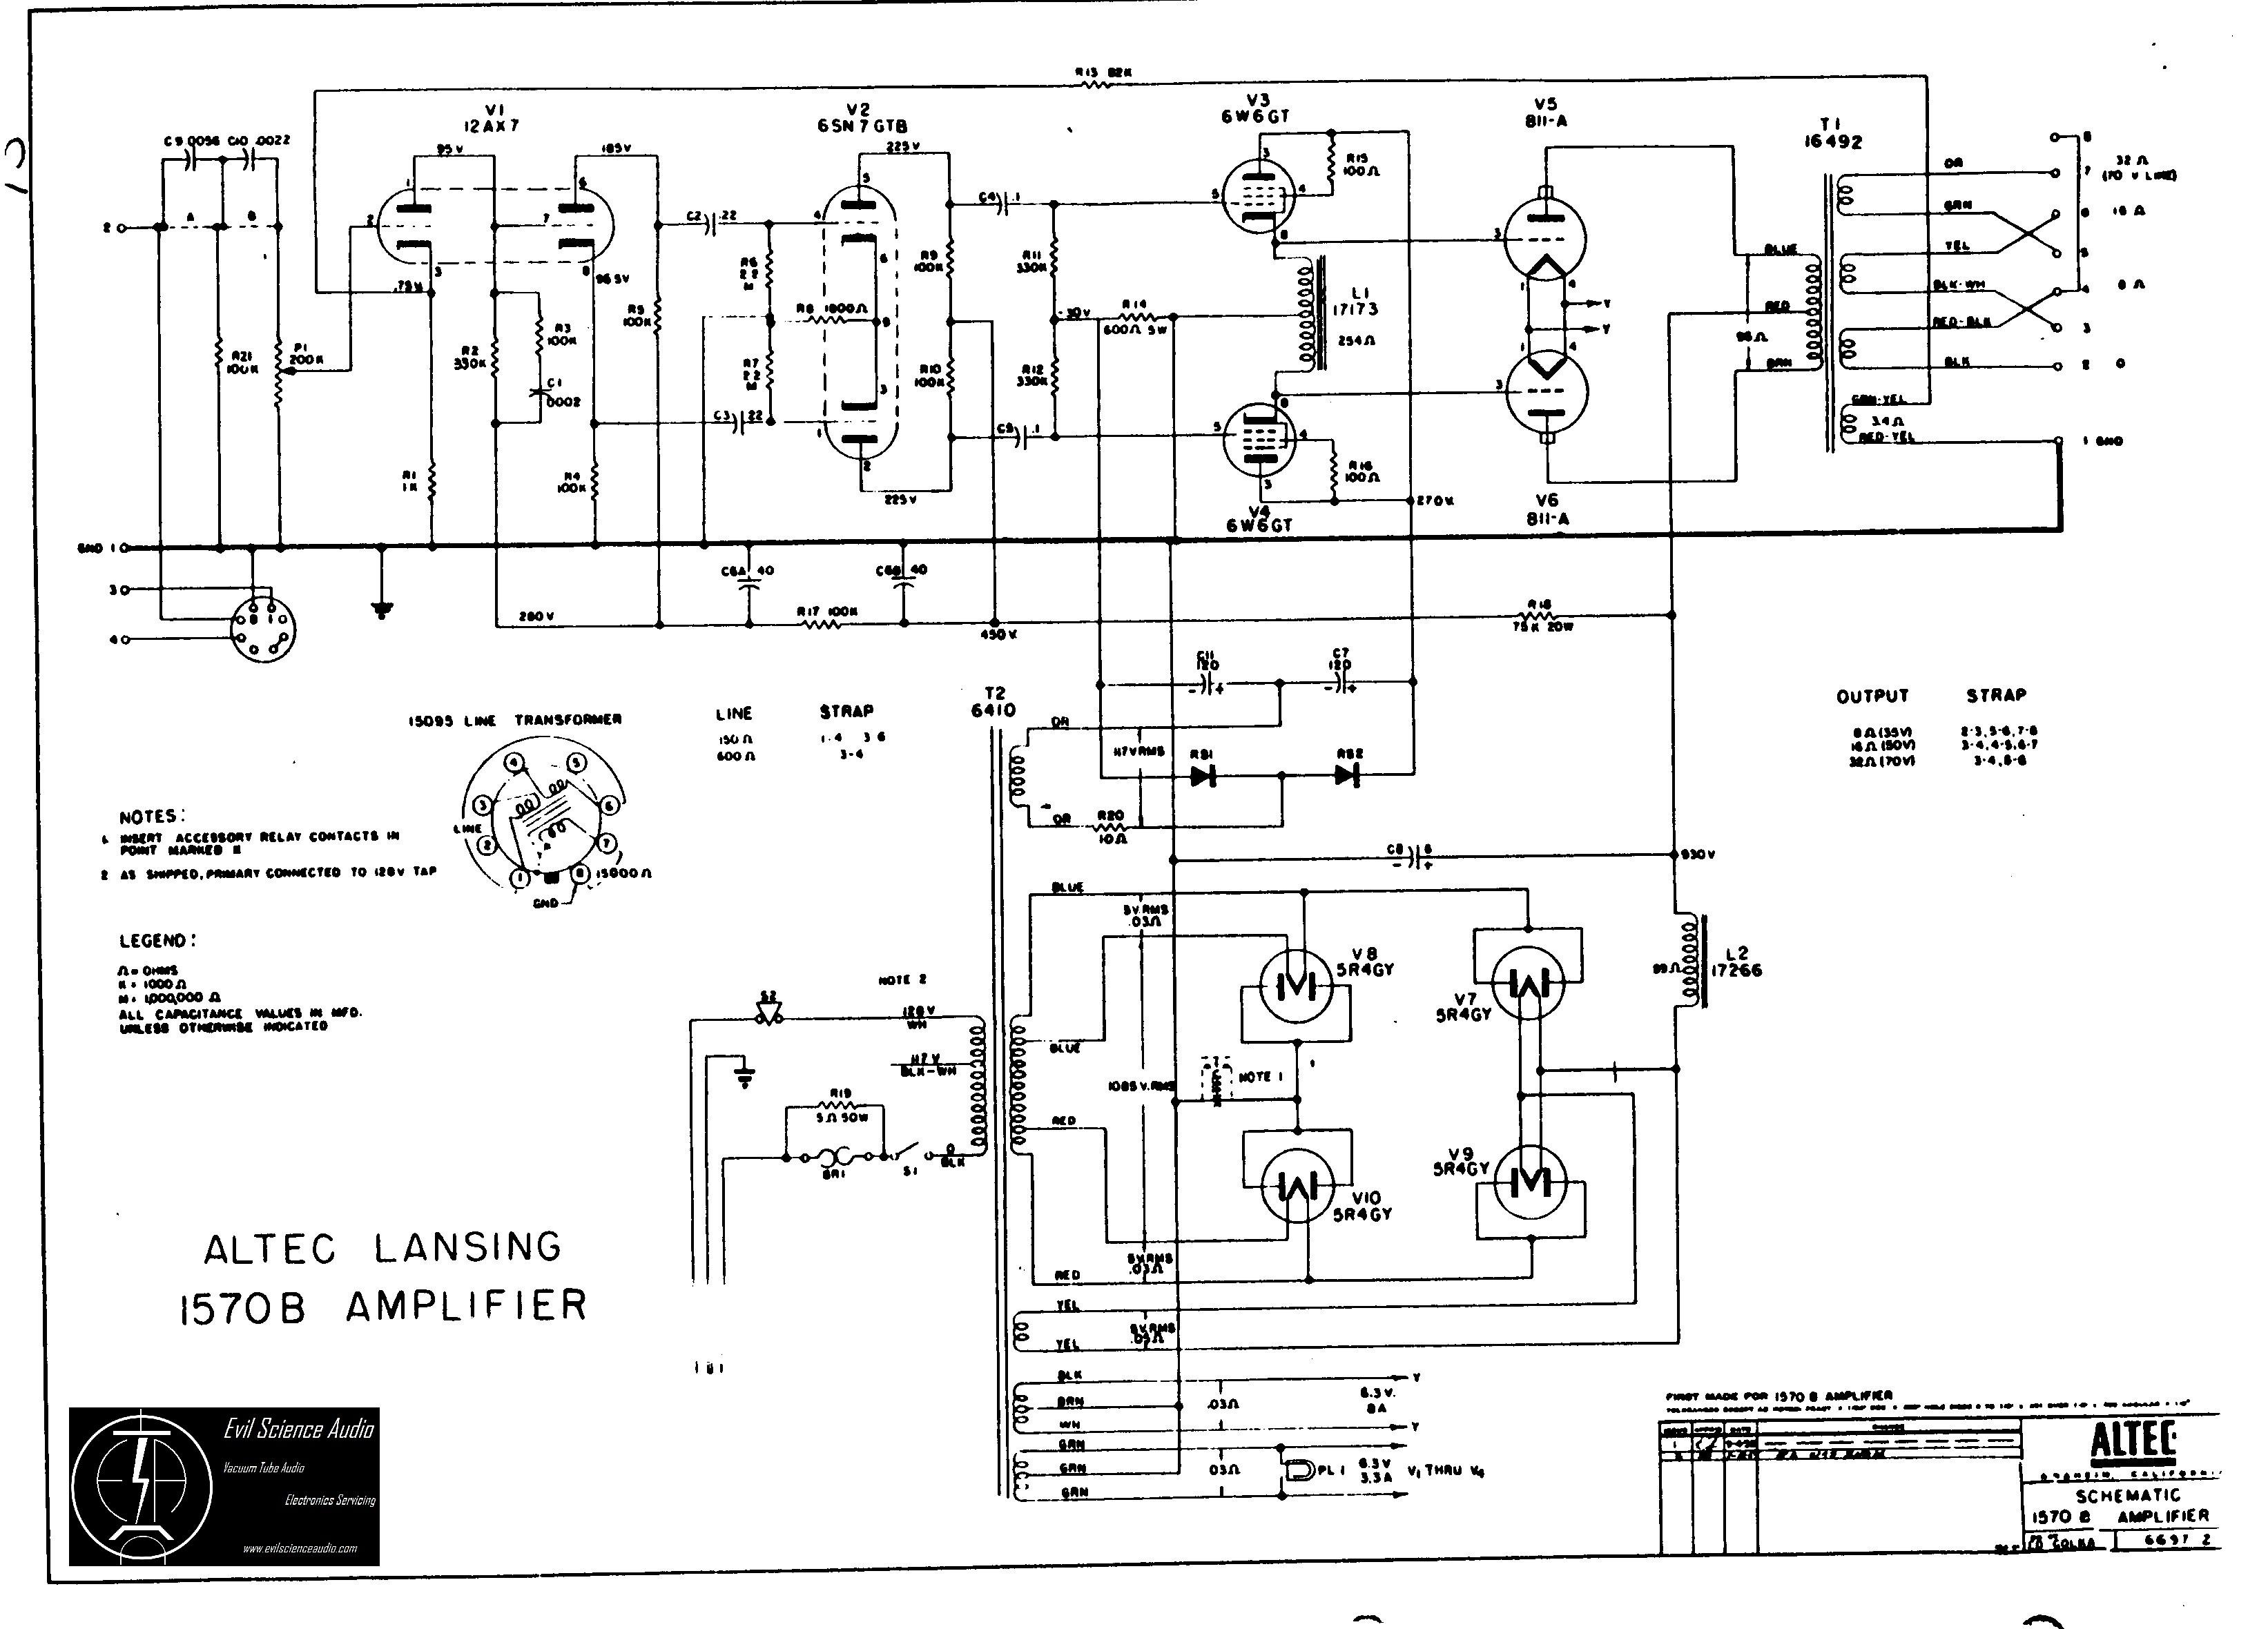 Altec Lansing Speaker Wiring Diagram - 1.14.msjsports.nl • on code 3 speaker, code alarm fuse diagram, code 3 lights, code 3 battery, code 3 mx7000 wiring, 3 wire sensor diagram, code 3 ford, code 3 xl, code alarm remote start wiring diagram, code wiring harness diagram, code 3 parts, code 3 as 2 installation wire diagram, code 3 cable, 3 wire circuit diagram,